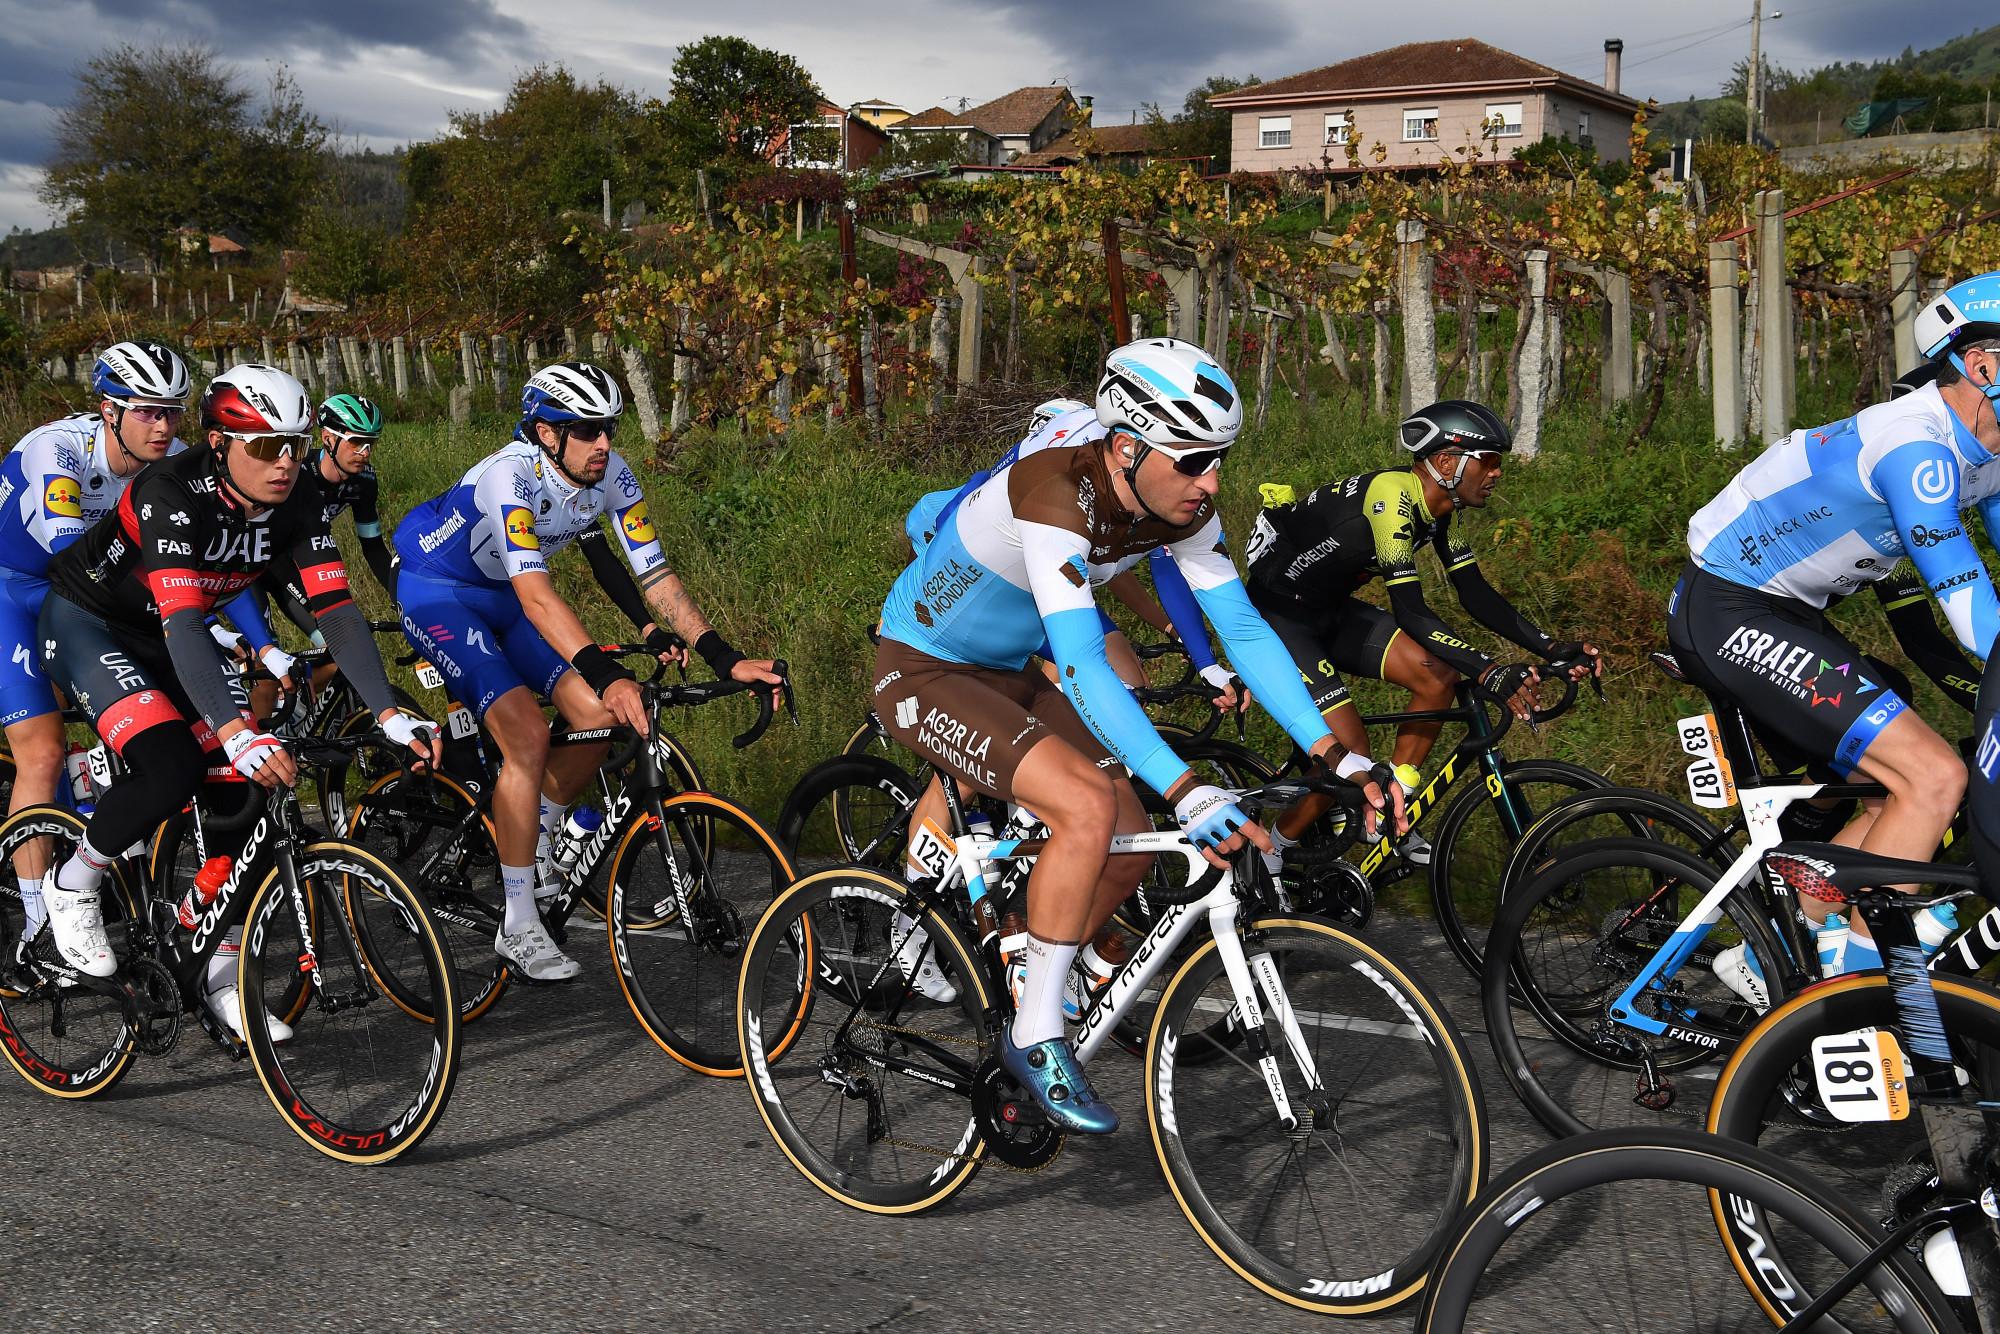 Nans Peters   La Vuelta ciclista a España - Stage 15